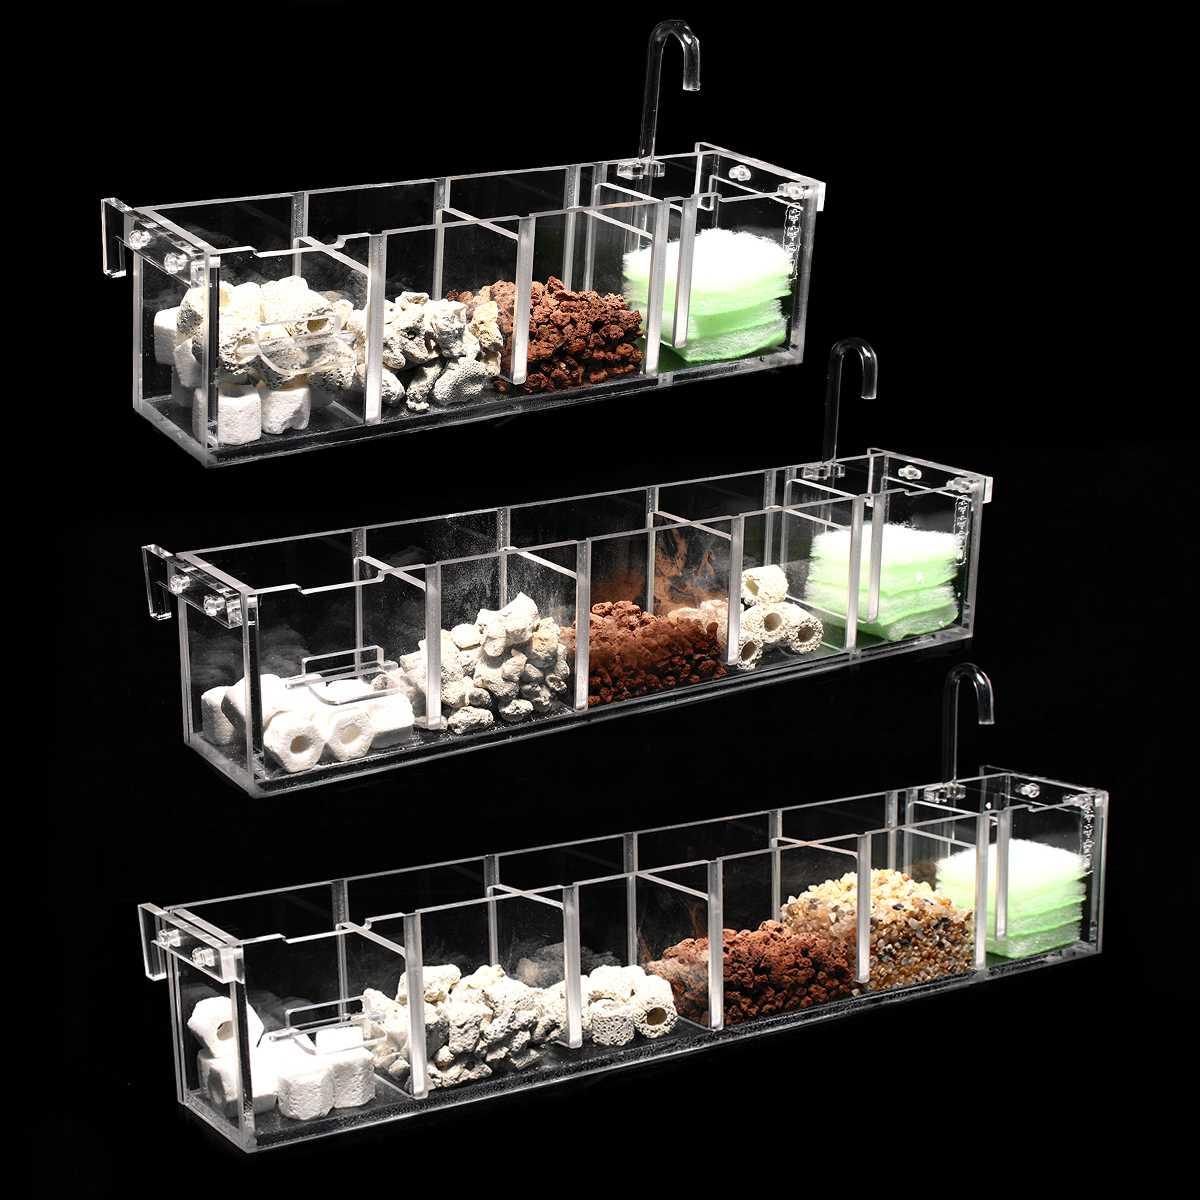 2-6 Grids Fish Tank Aquarium Filter Box Acrylic External Hanging Water Purifier Aquatic Pet Cage Increase Oxygen Filter Supplies